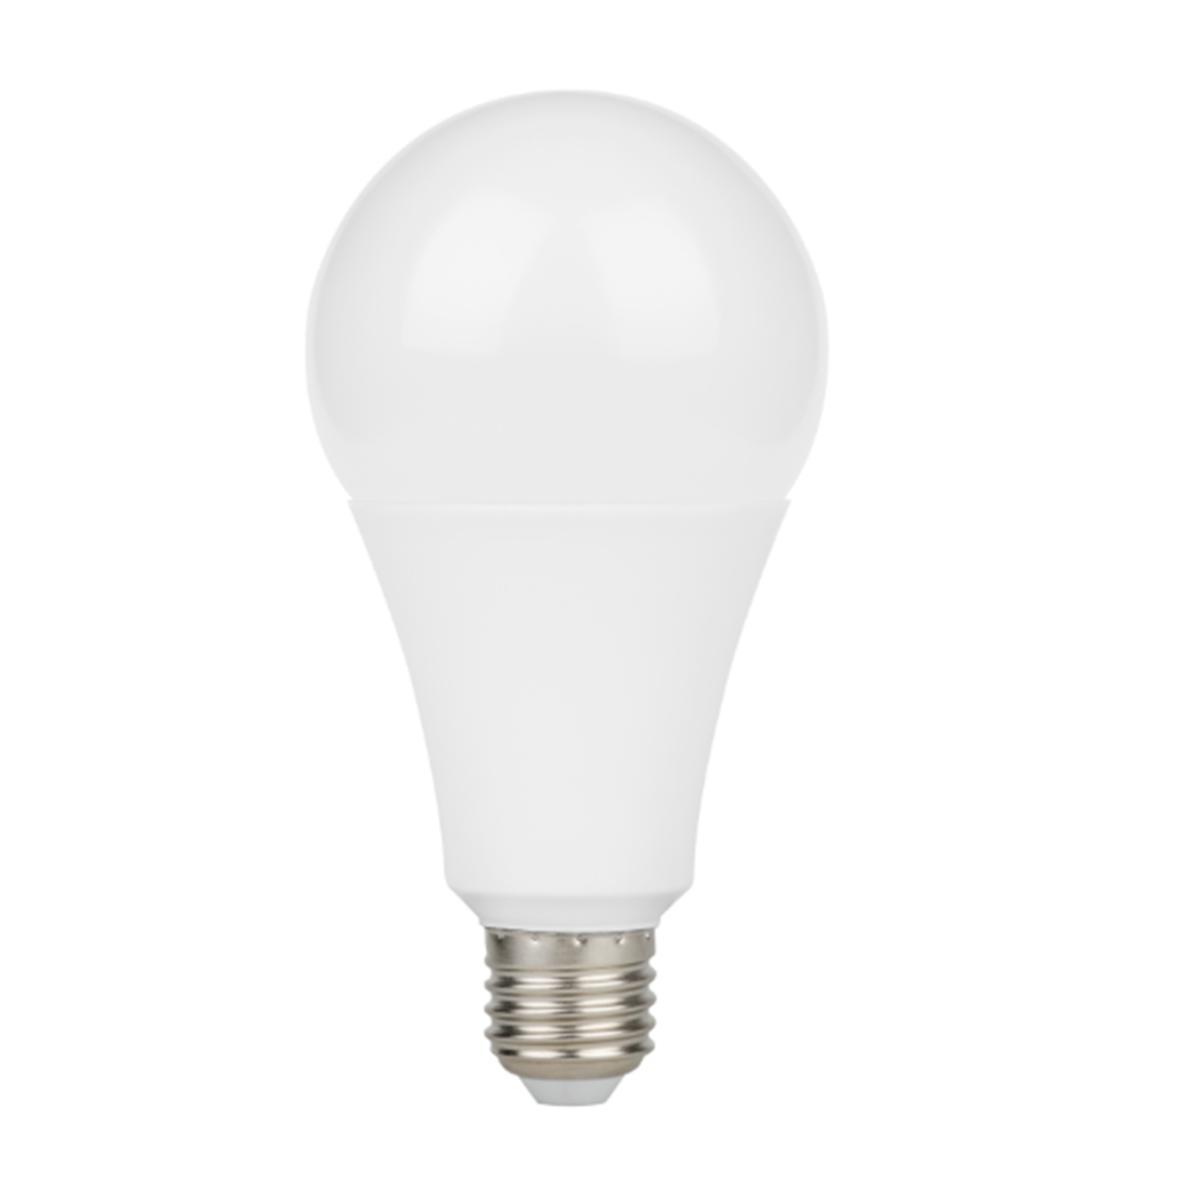 SILAMP Ampoule LED E27 9W A60 220V 230° - Blanc Chaud 2300K - 3500K